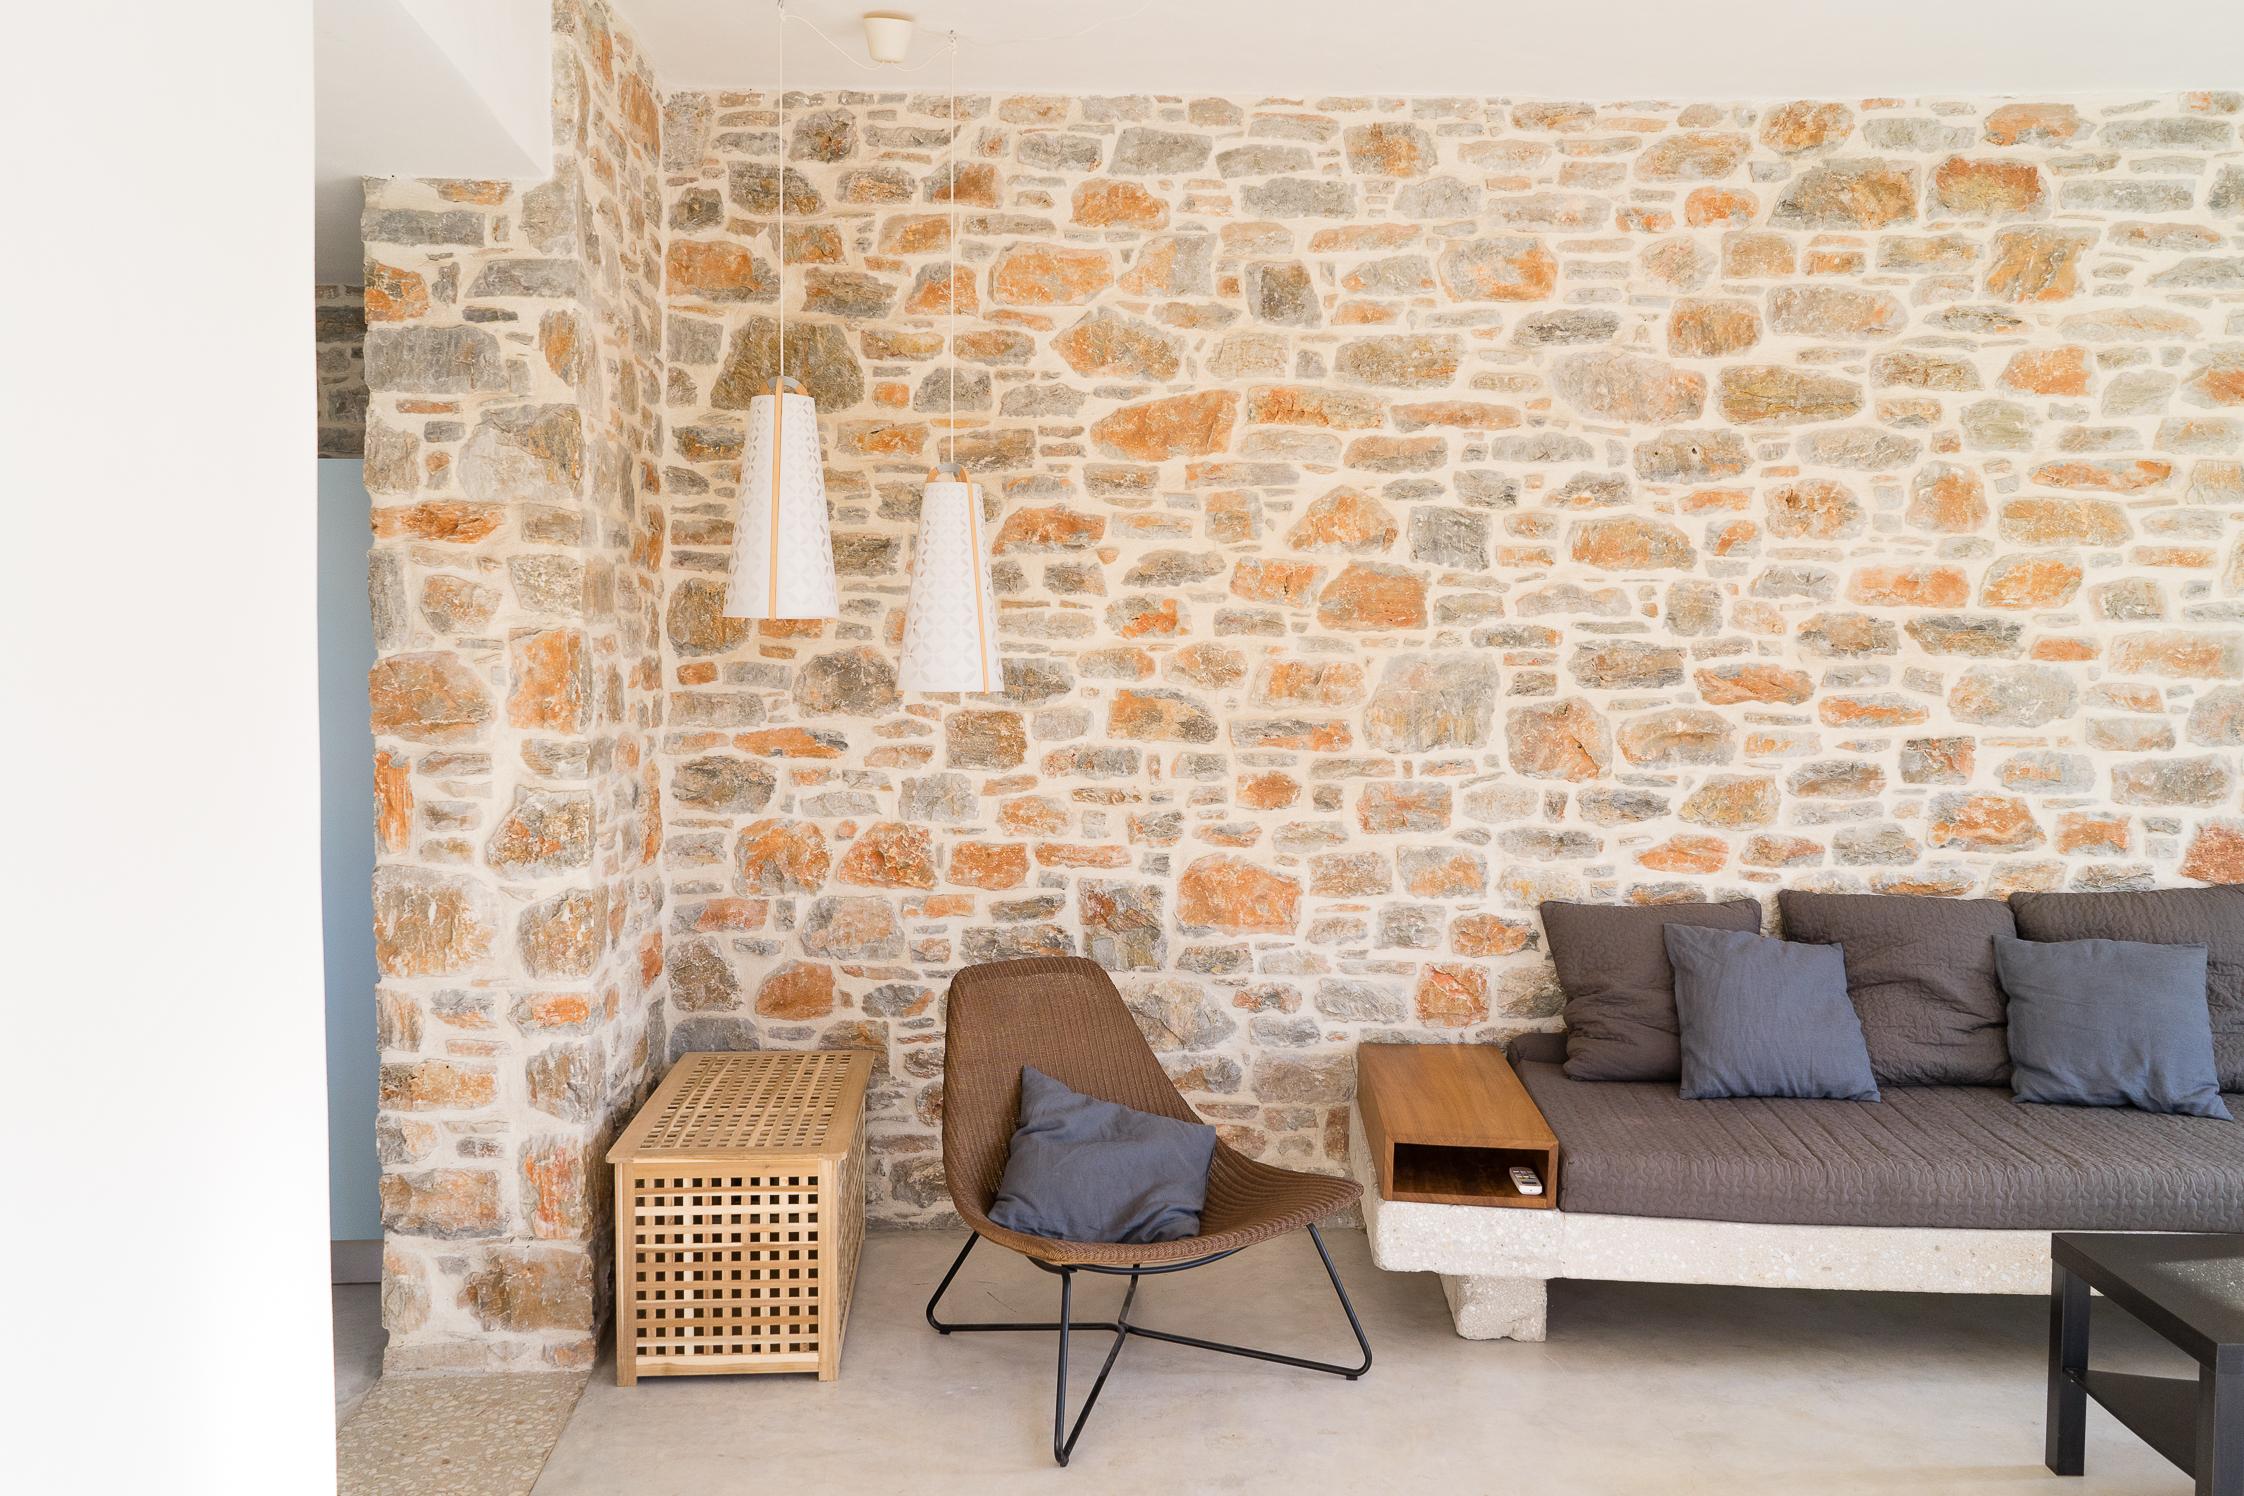 Indoor stonework